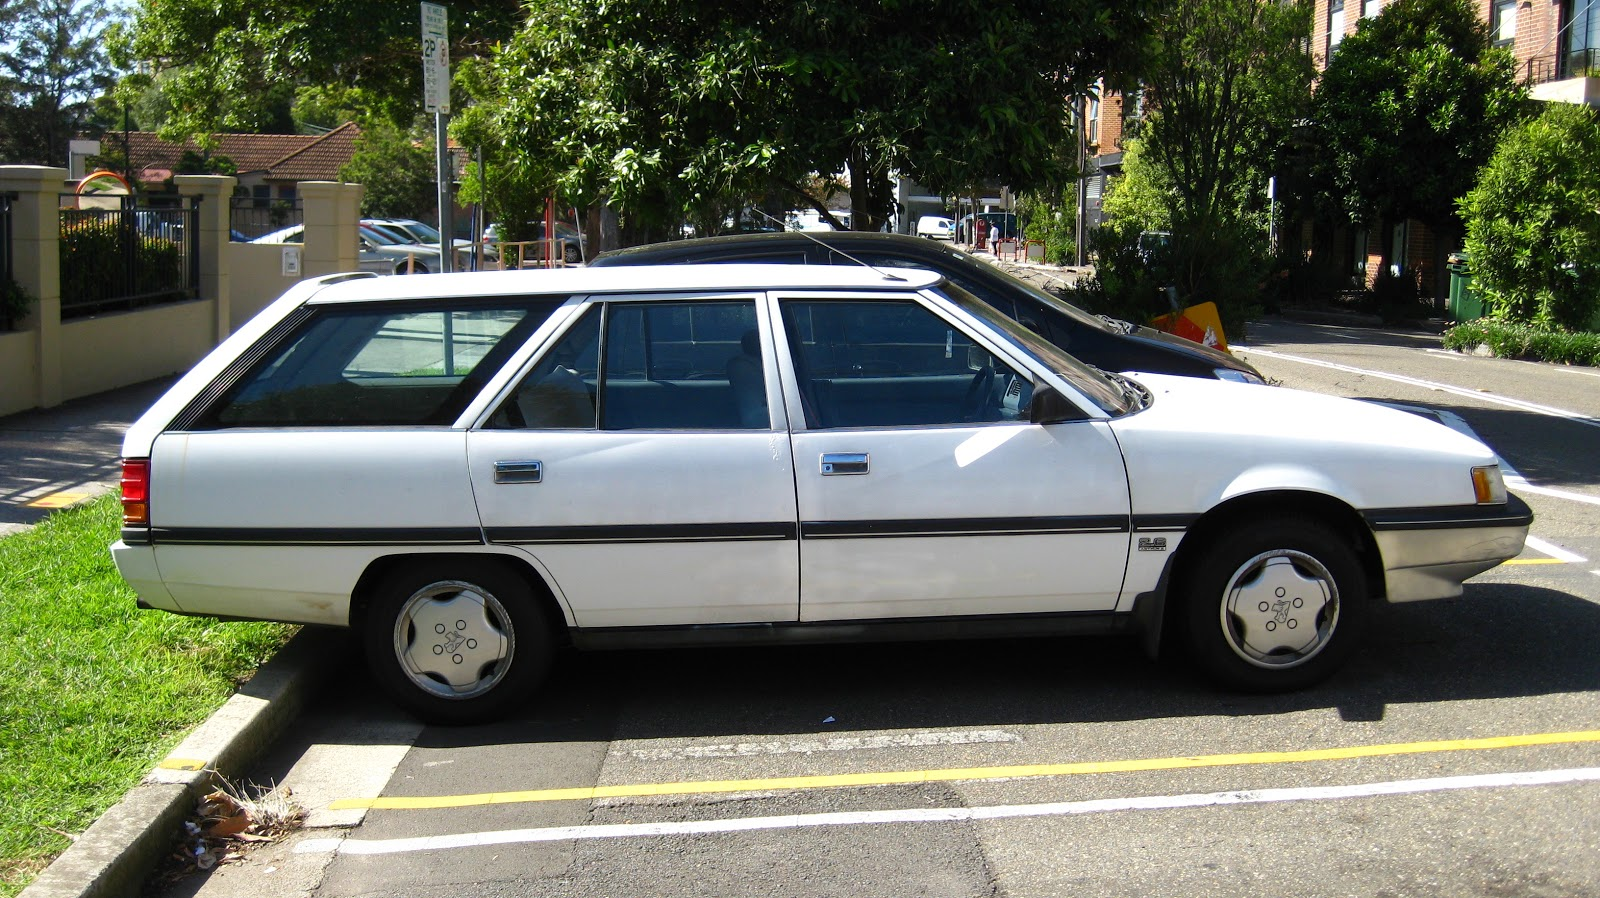 Aussie Old Parked Cars  1987 Mitsubishi Magna GLX 2 6 Wagon